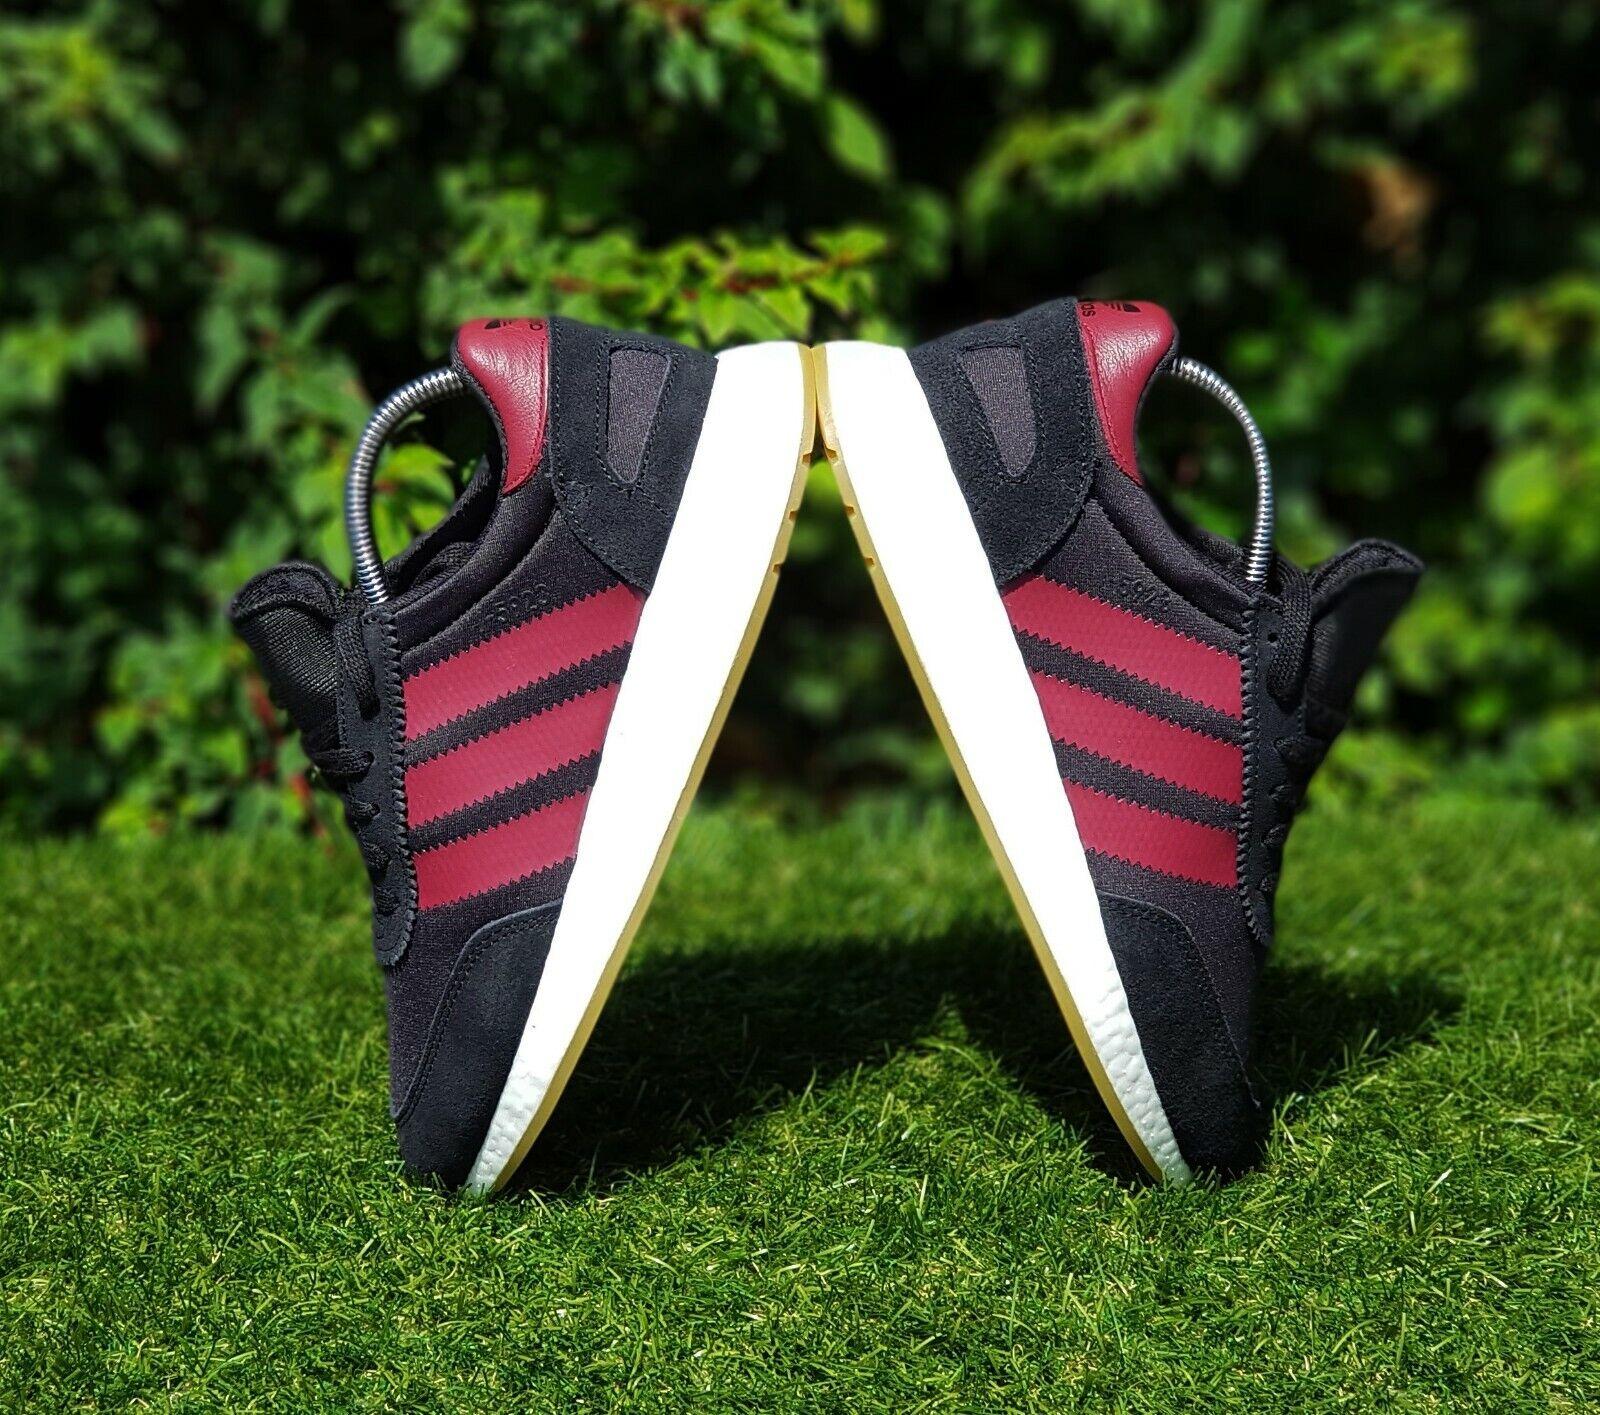 BNWB & Auténtico Adidas Originals ® I-5923 Boost ™ Iniki Retro Entrenadores UK Talla 9